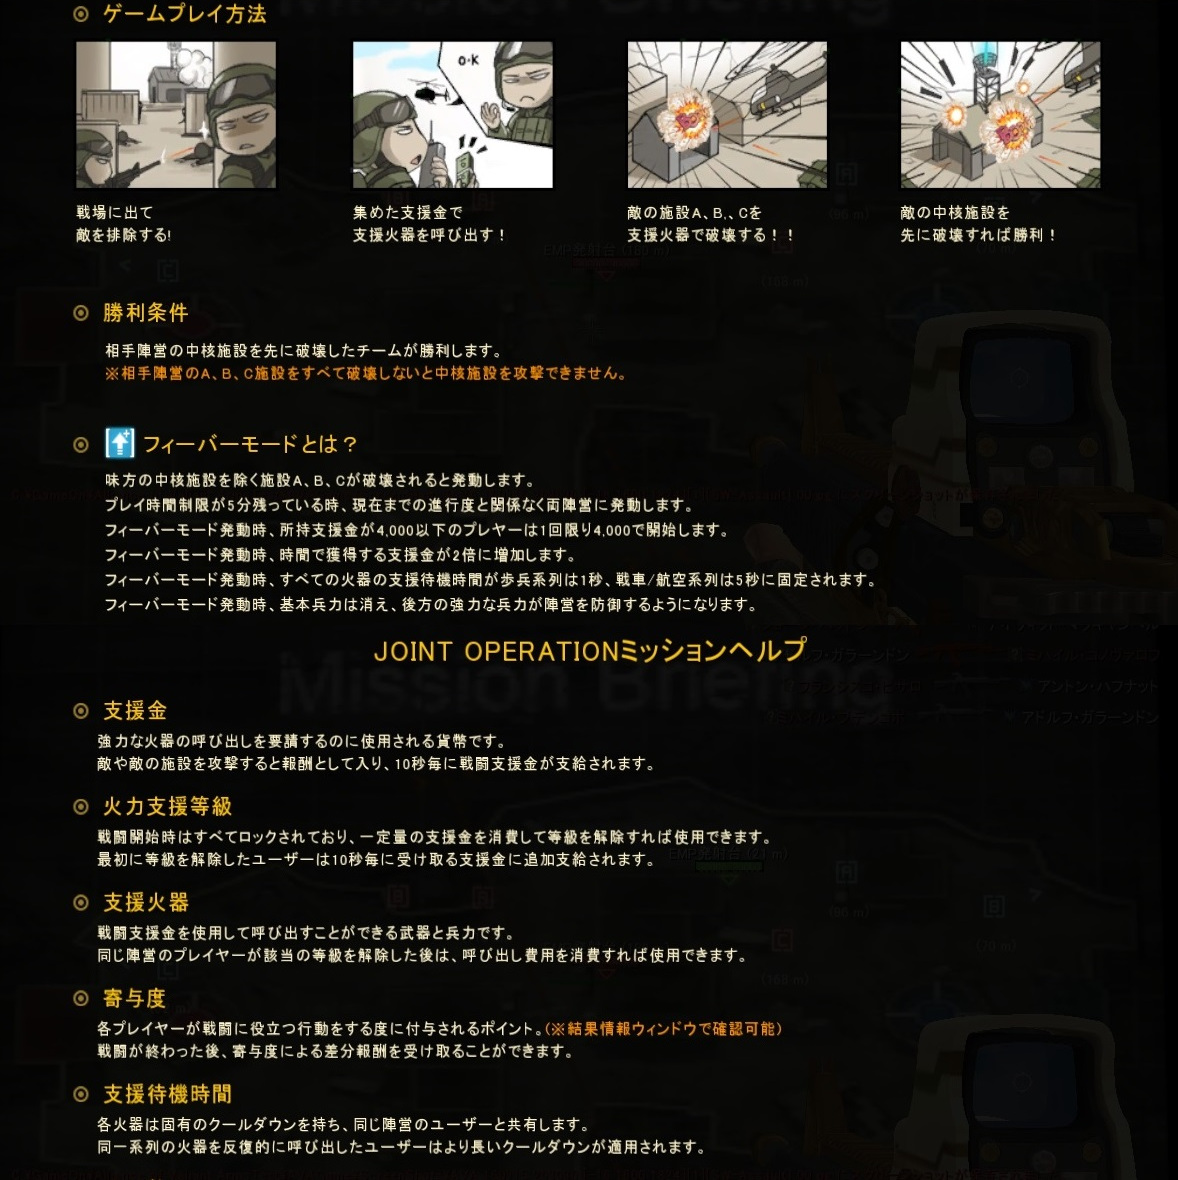 Joint_Operation_help_4.jpg